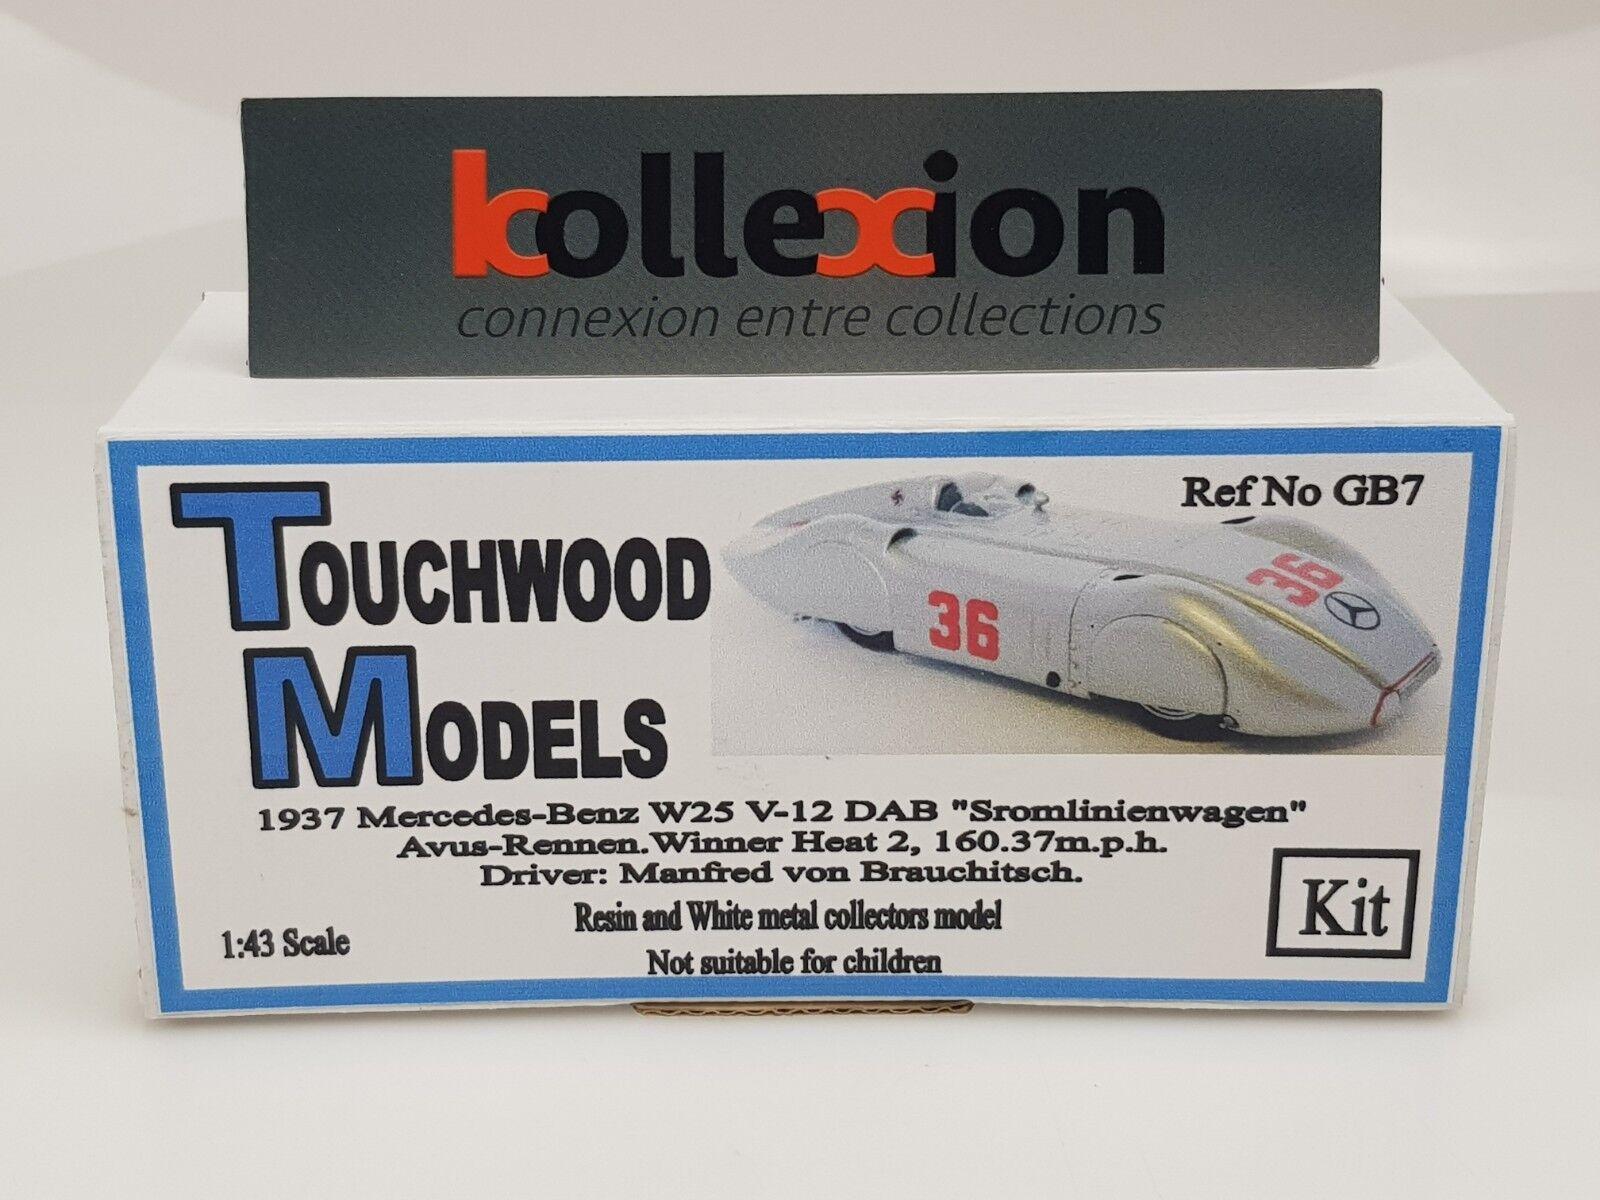 TOUCHWOOD MODELS MODELS MODELS TWCGB7 MERCEDES BENZ W125 STROMIENEN Record Avus 1937 Kit 1.43 a498db